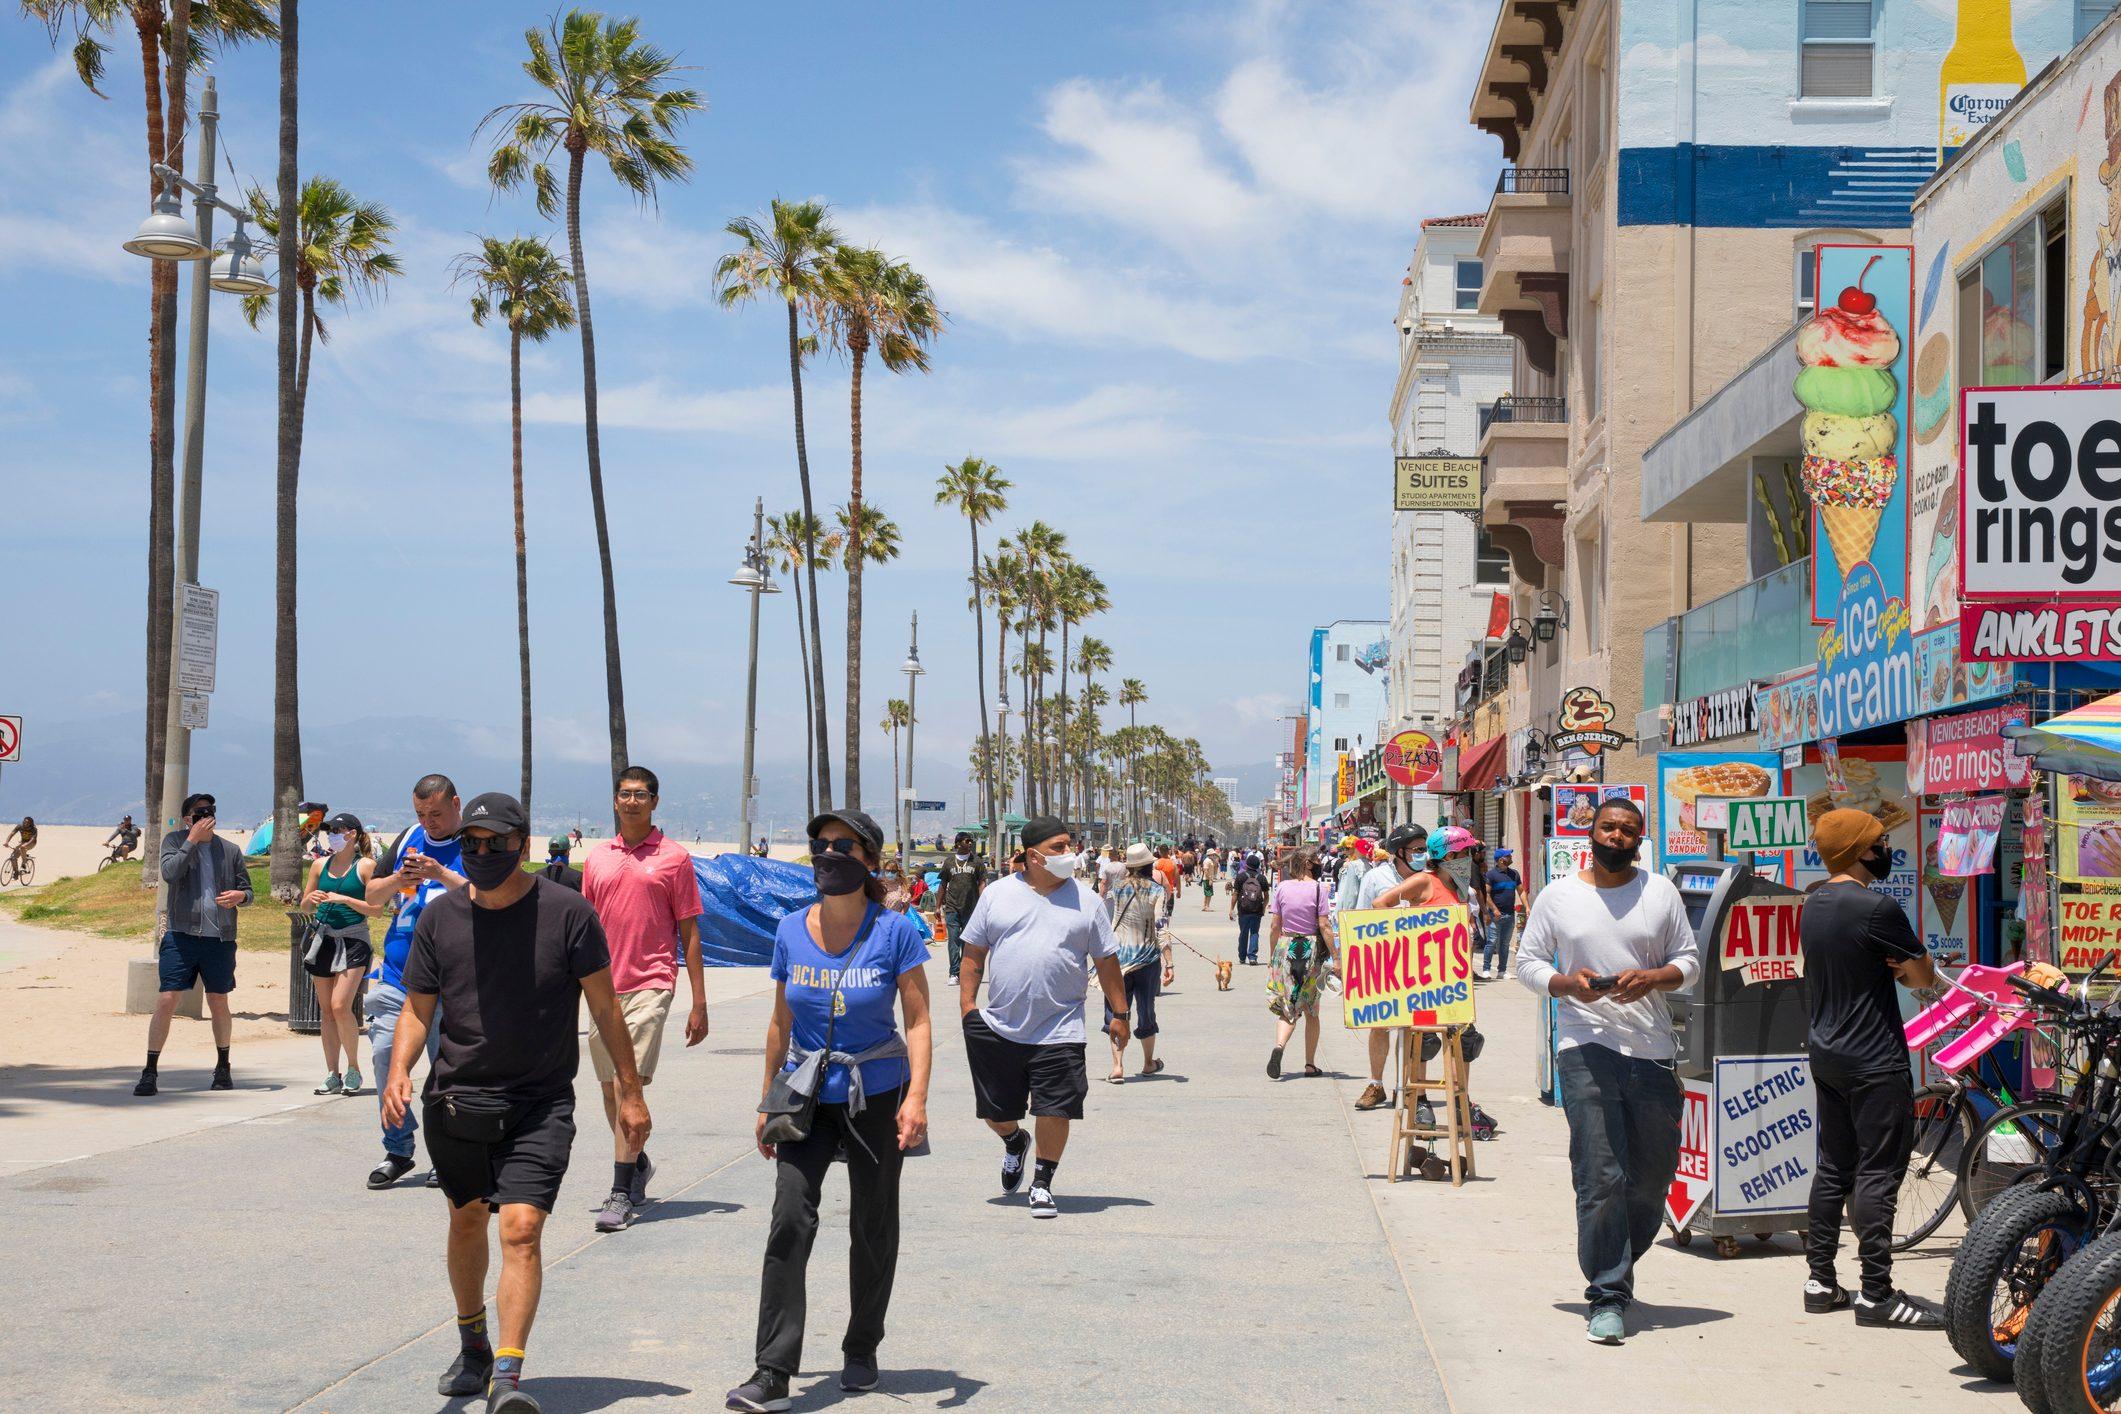 Venice Beach California during COVID-19